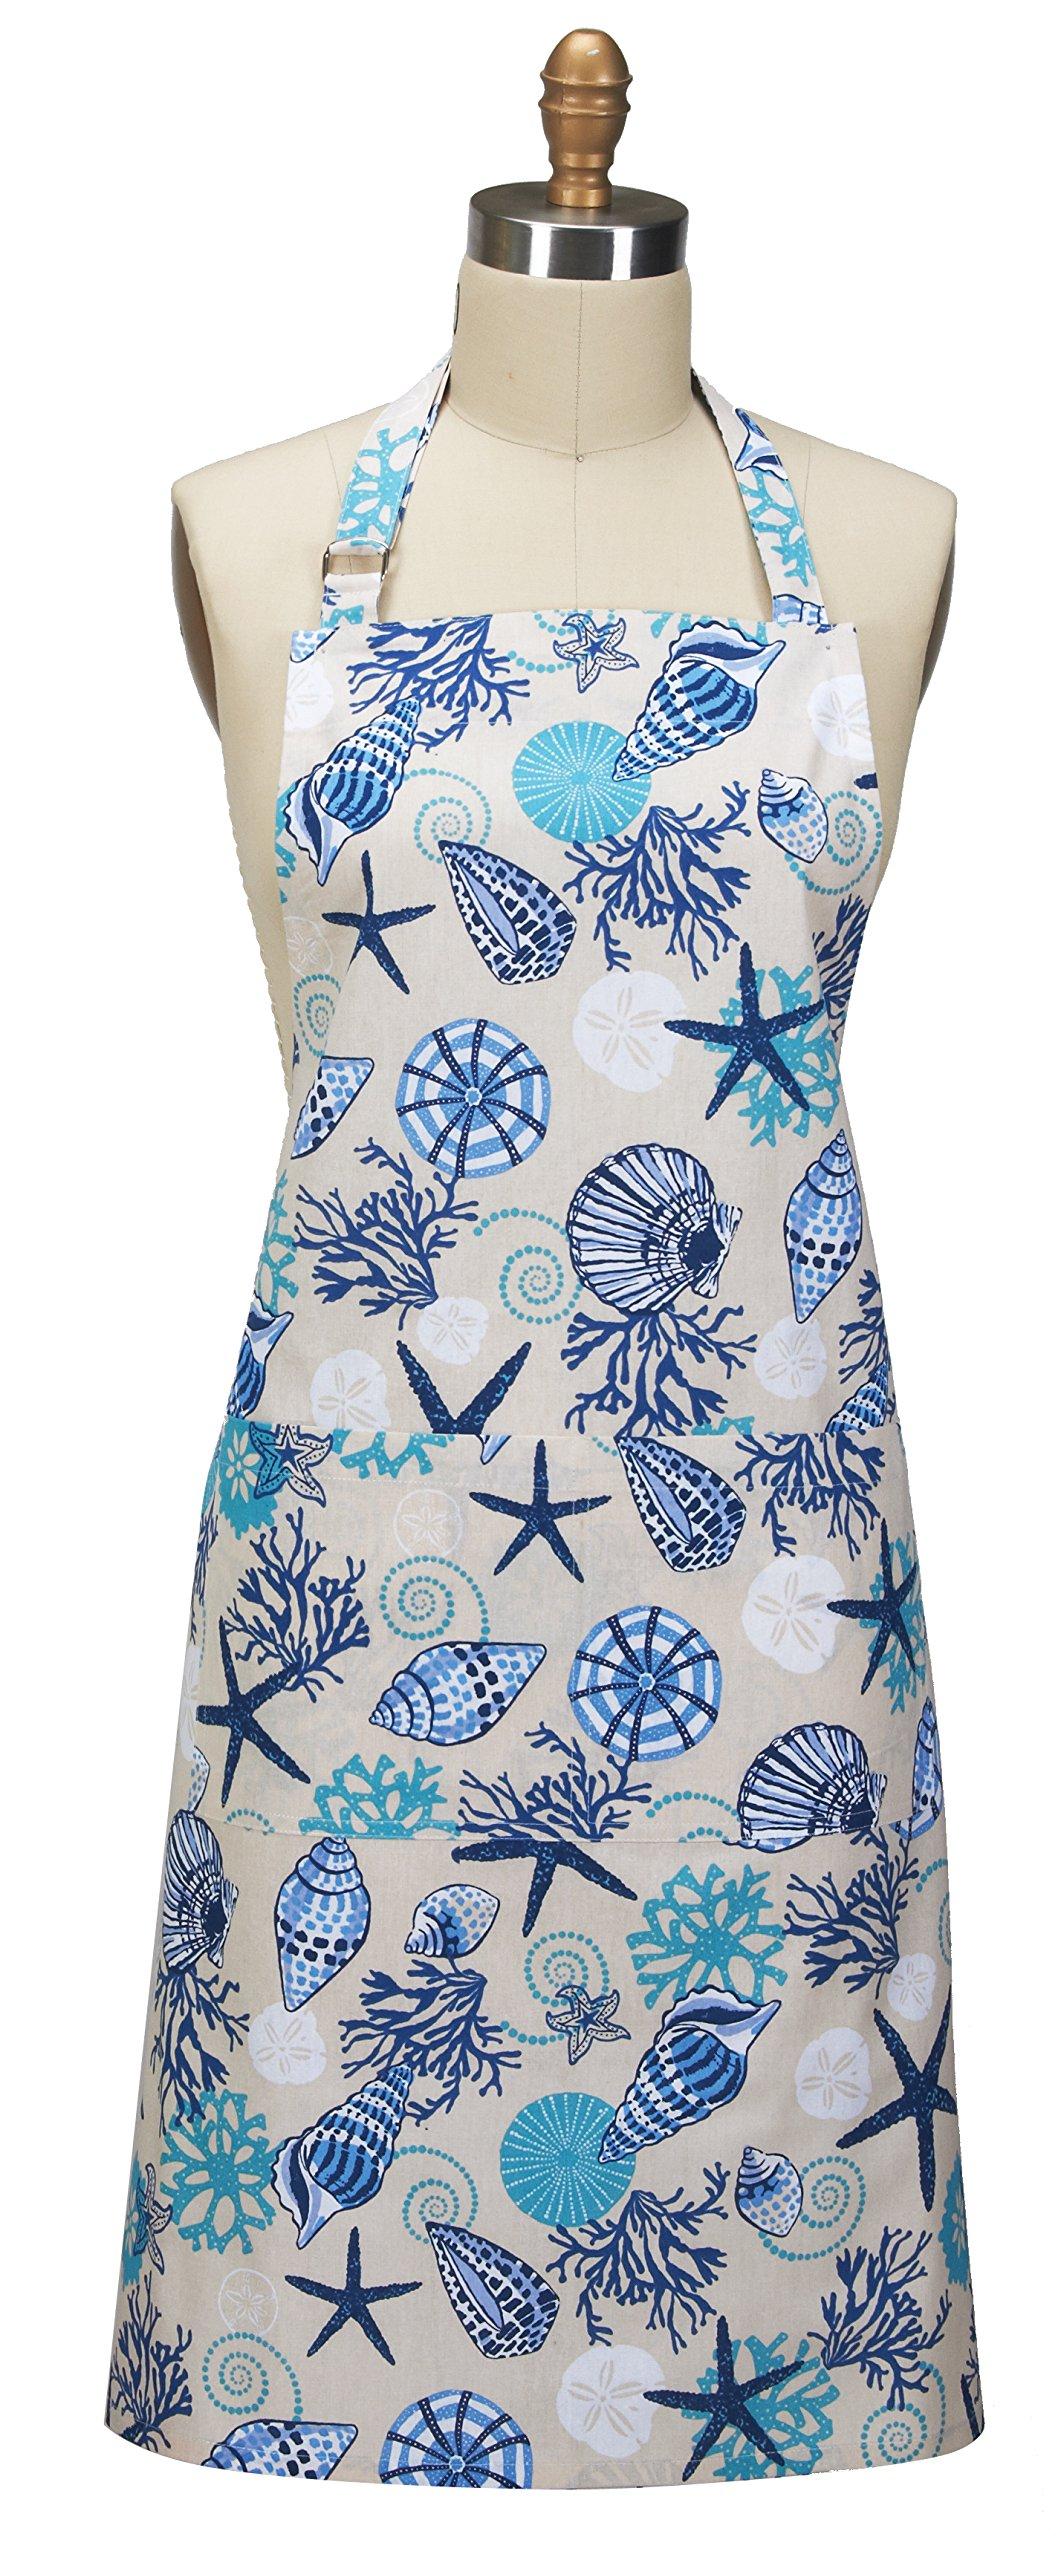 Kay Dee Designs Blue Shells Chef Apron